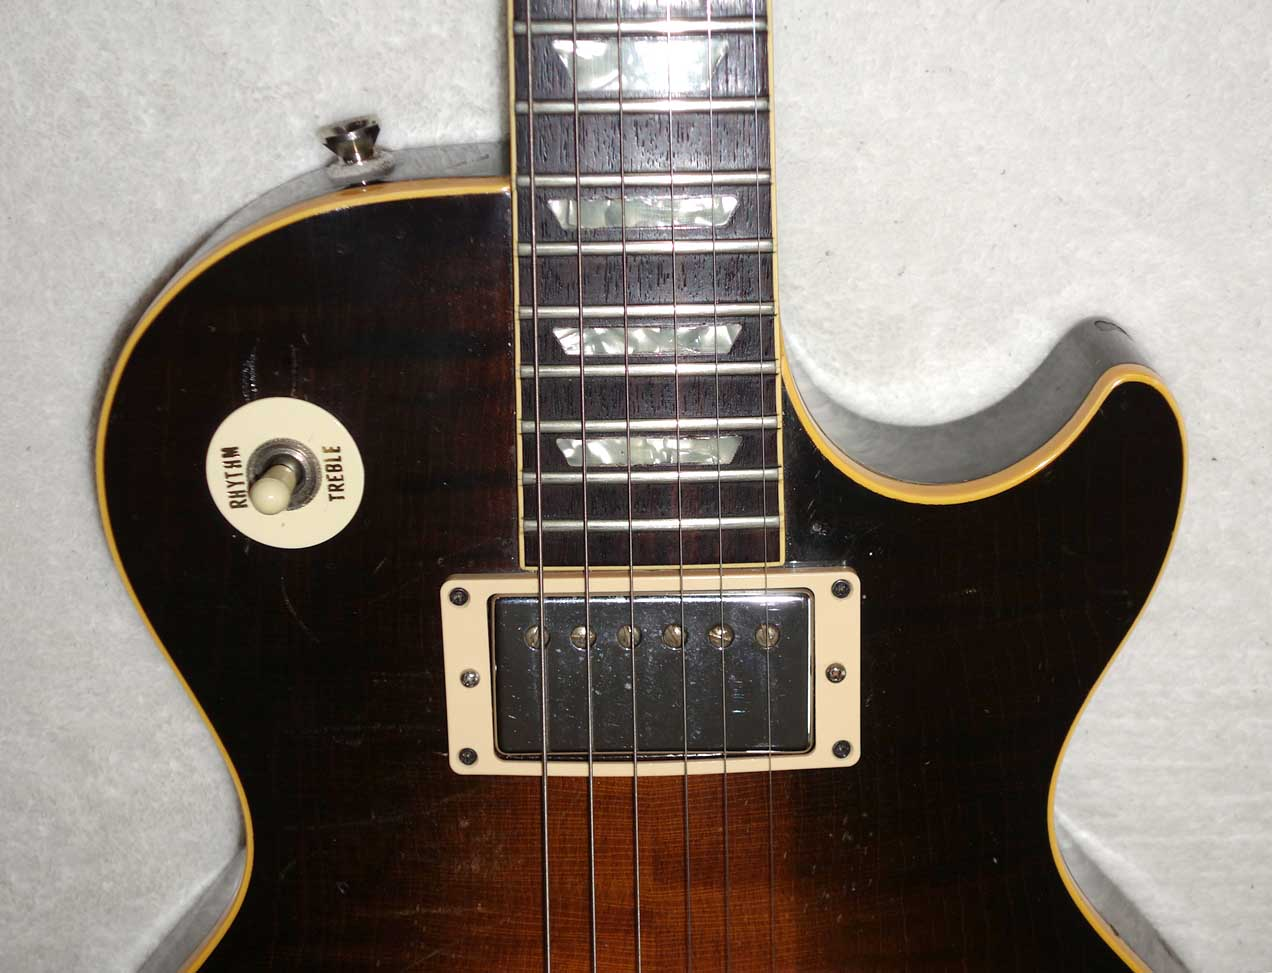 Vintage 1985 Les Paul Standard, Flame Top